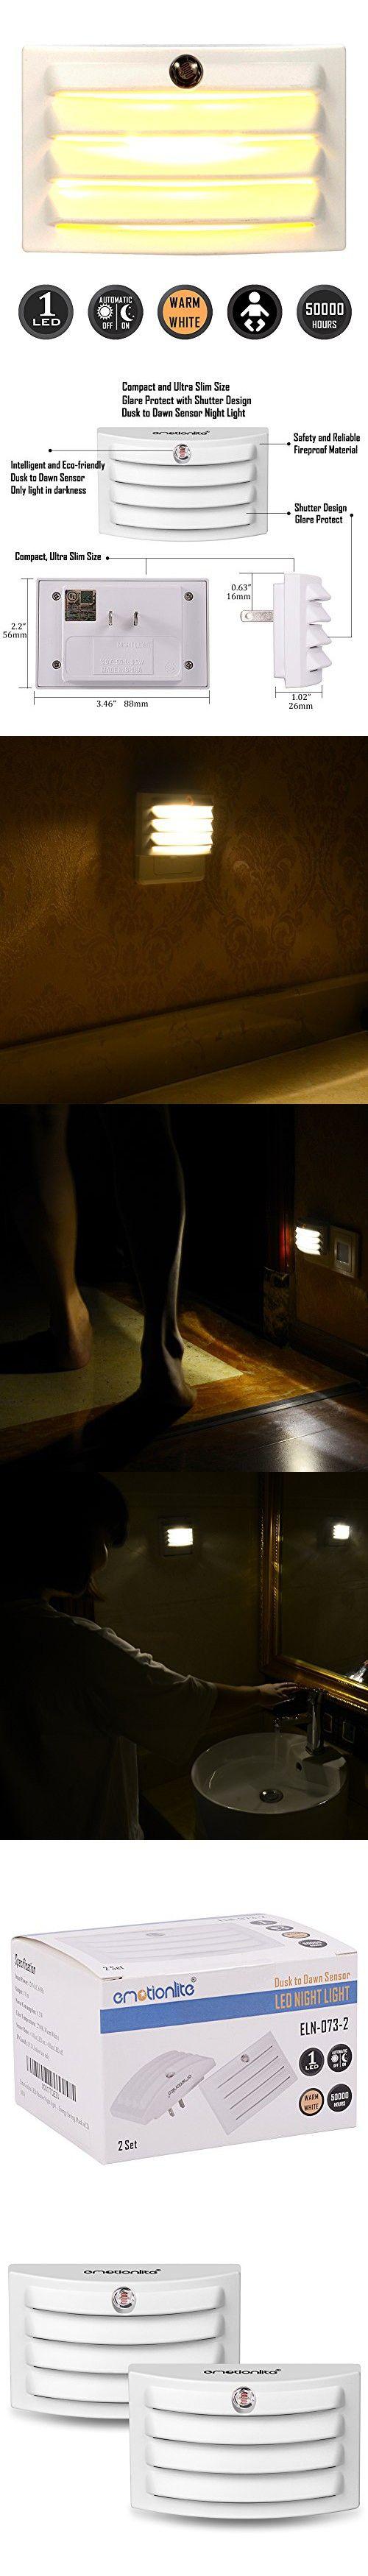 Led Bathroom Night Light best 25+ childrens night lights ideas on pinterest | plastic water